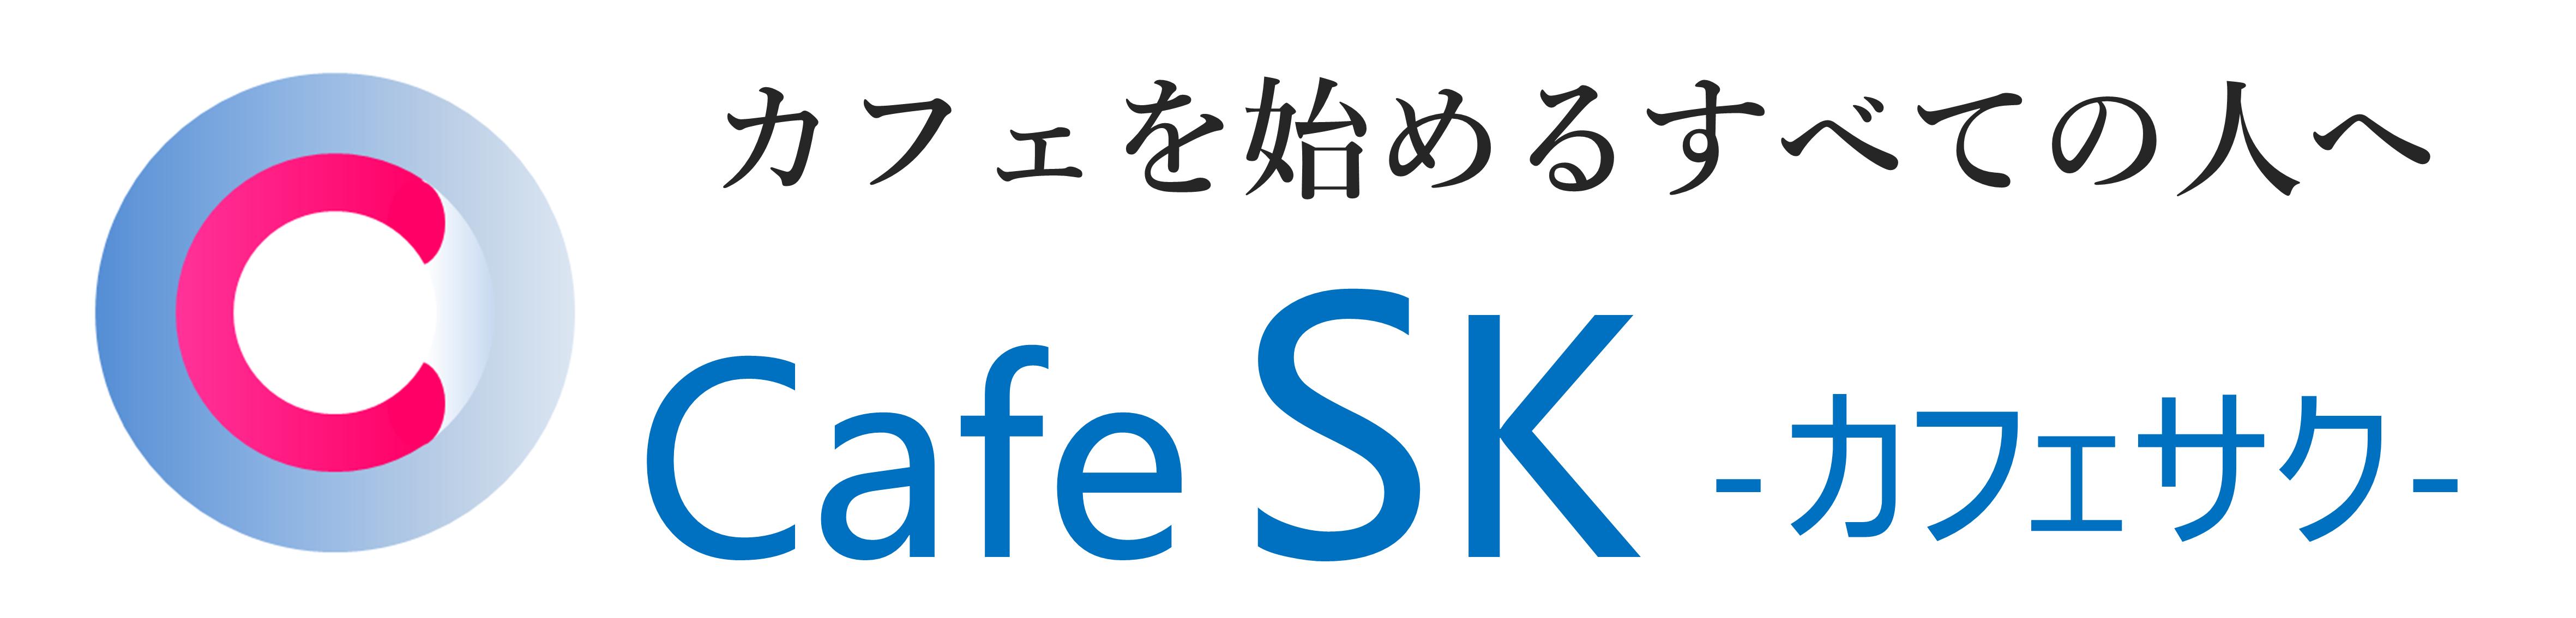 CafeSK -カフェサク-カフェ開業コンサルタントのビジネスブログ